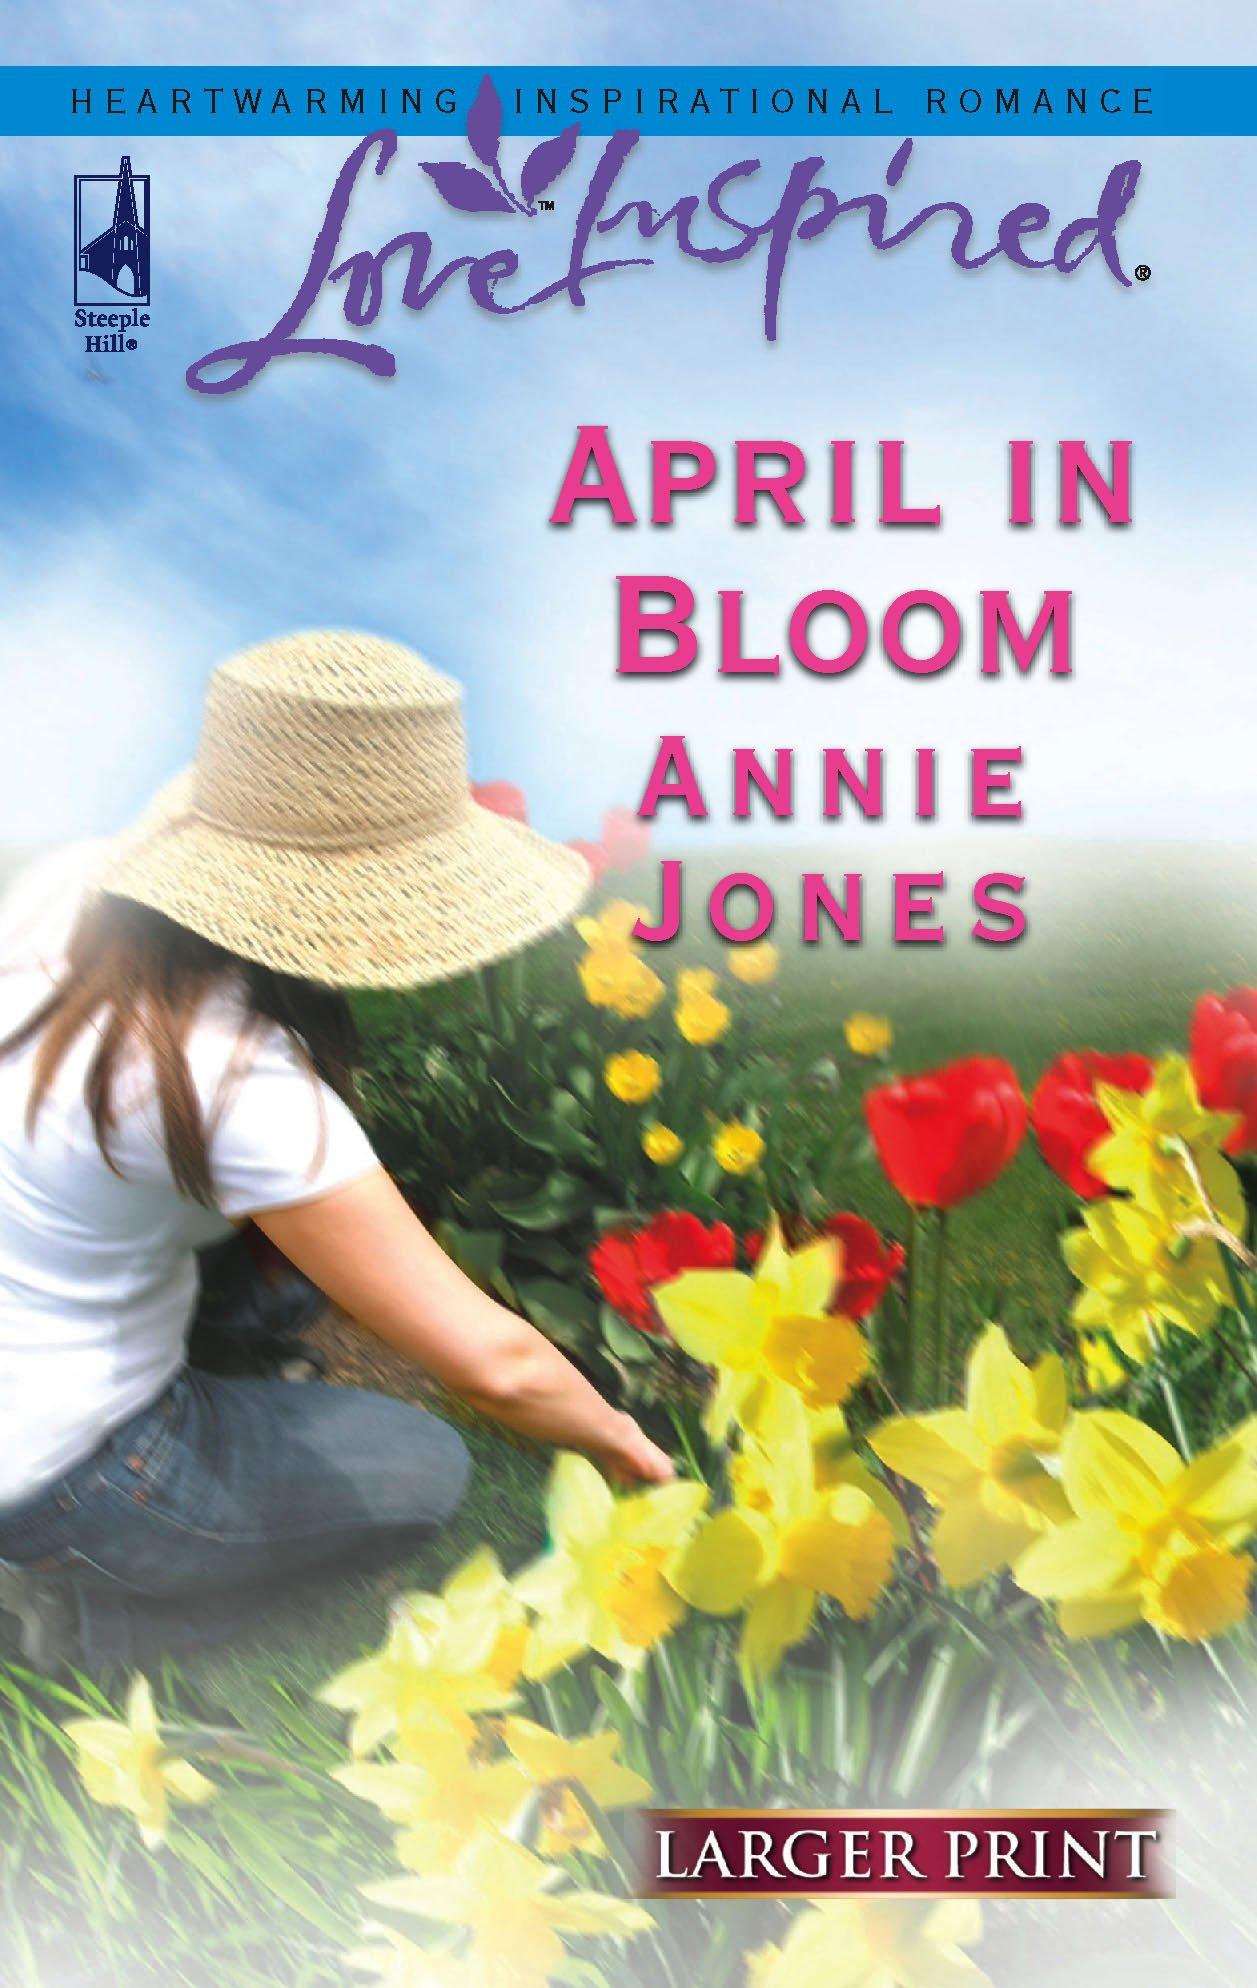 April in Bloom (Larger Print Love Inspired #343) ebook